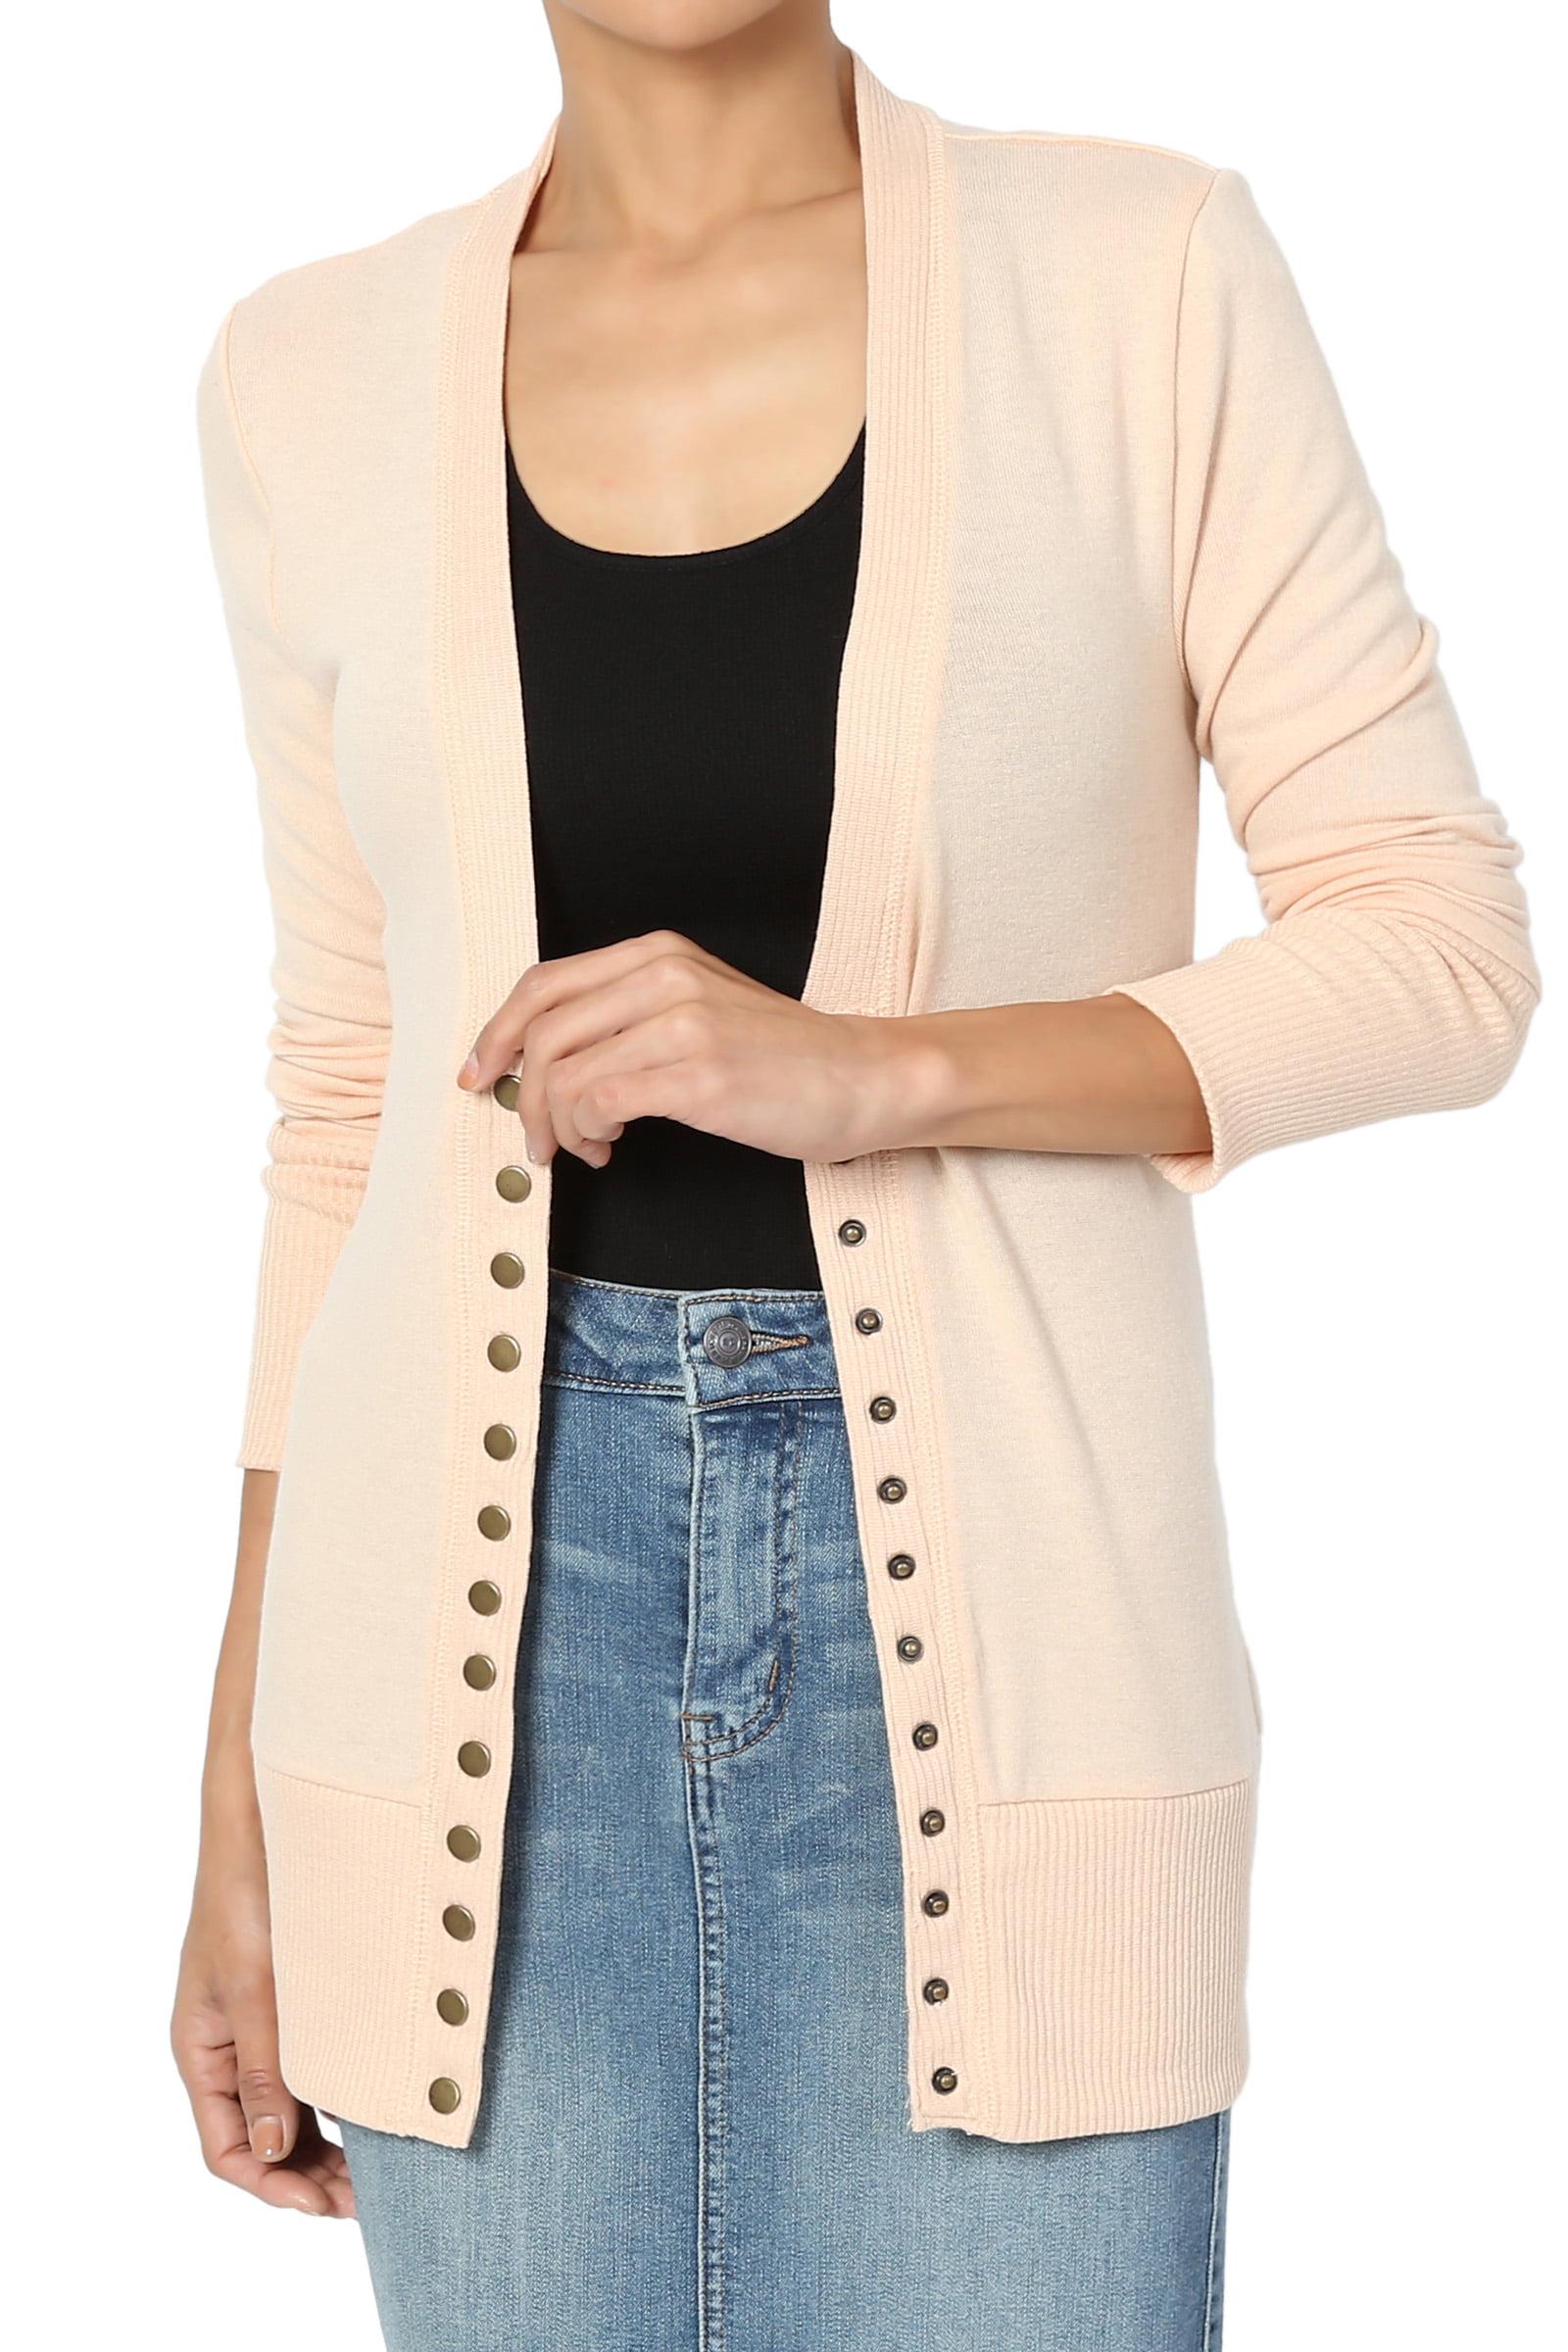 TheMogan Women's PLUS Basic Snap Button V-Neck Long Sleeve Knit Cardigan